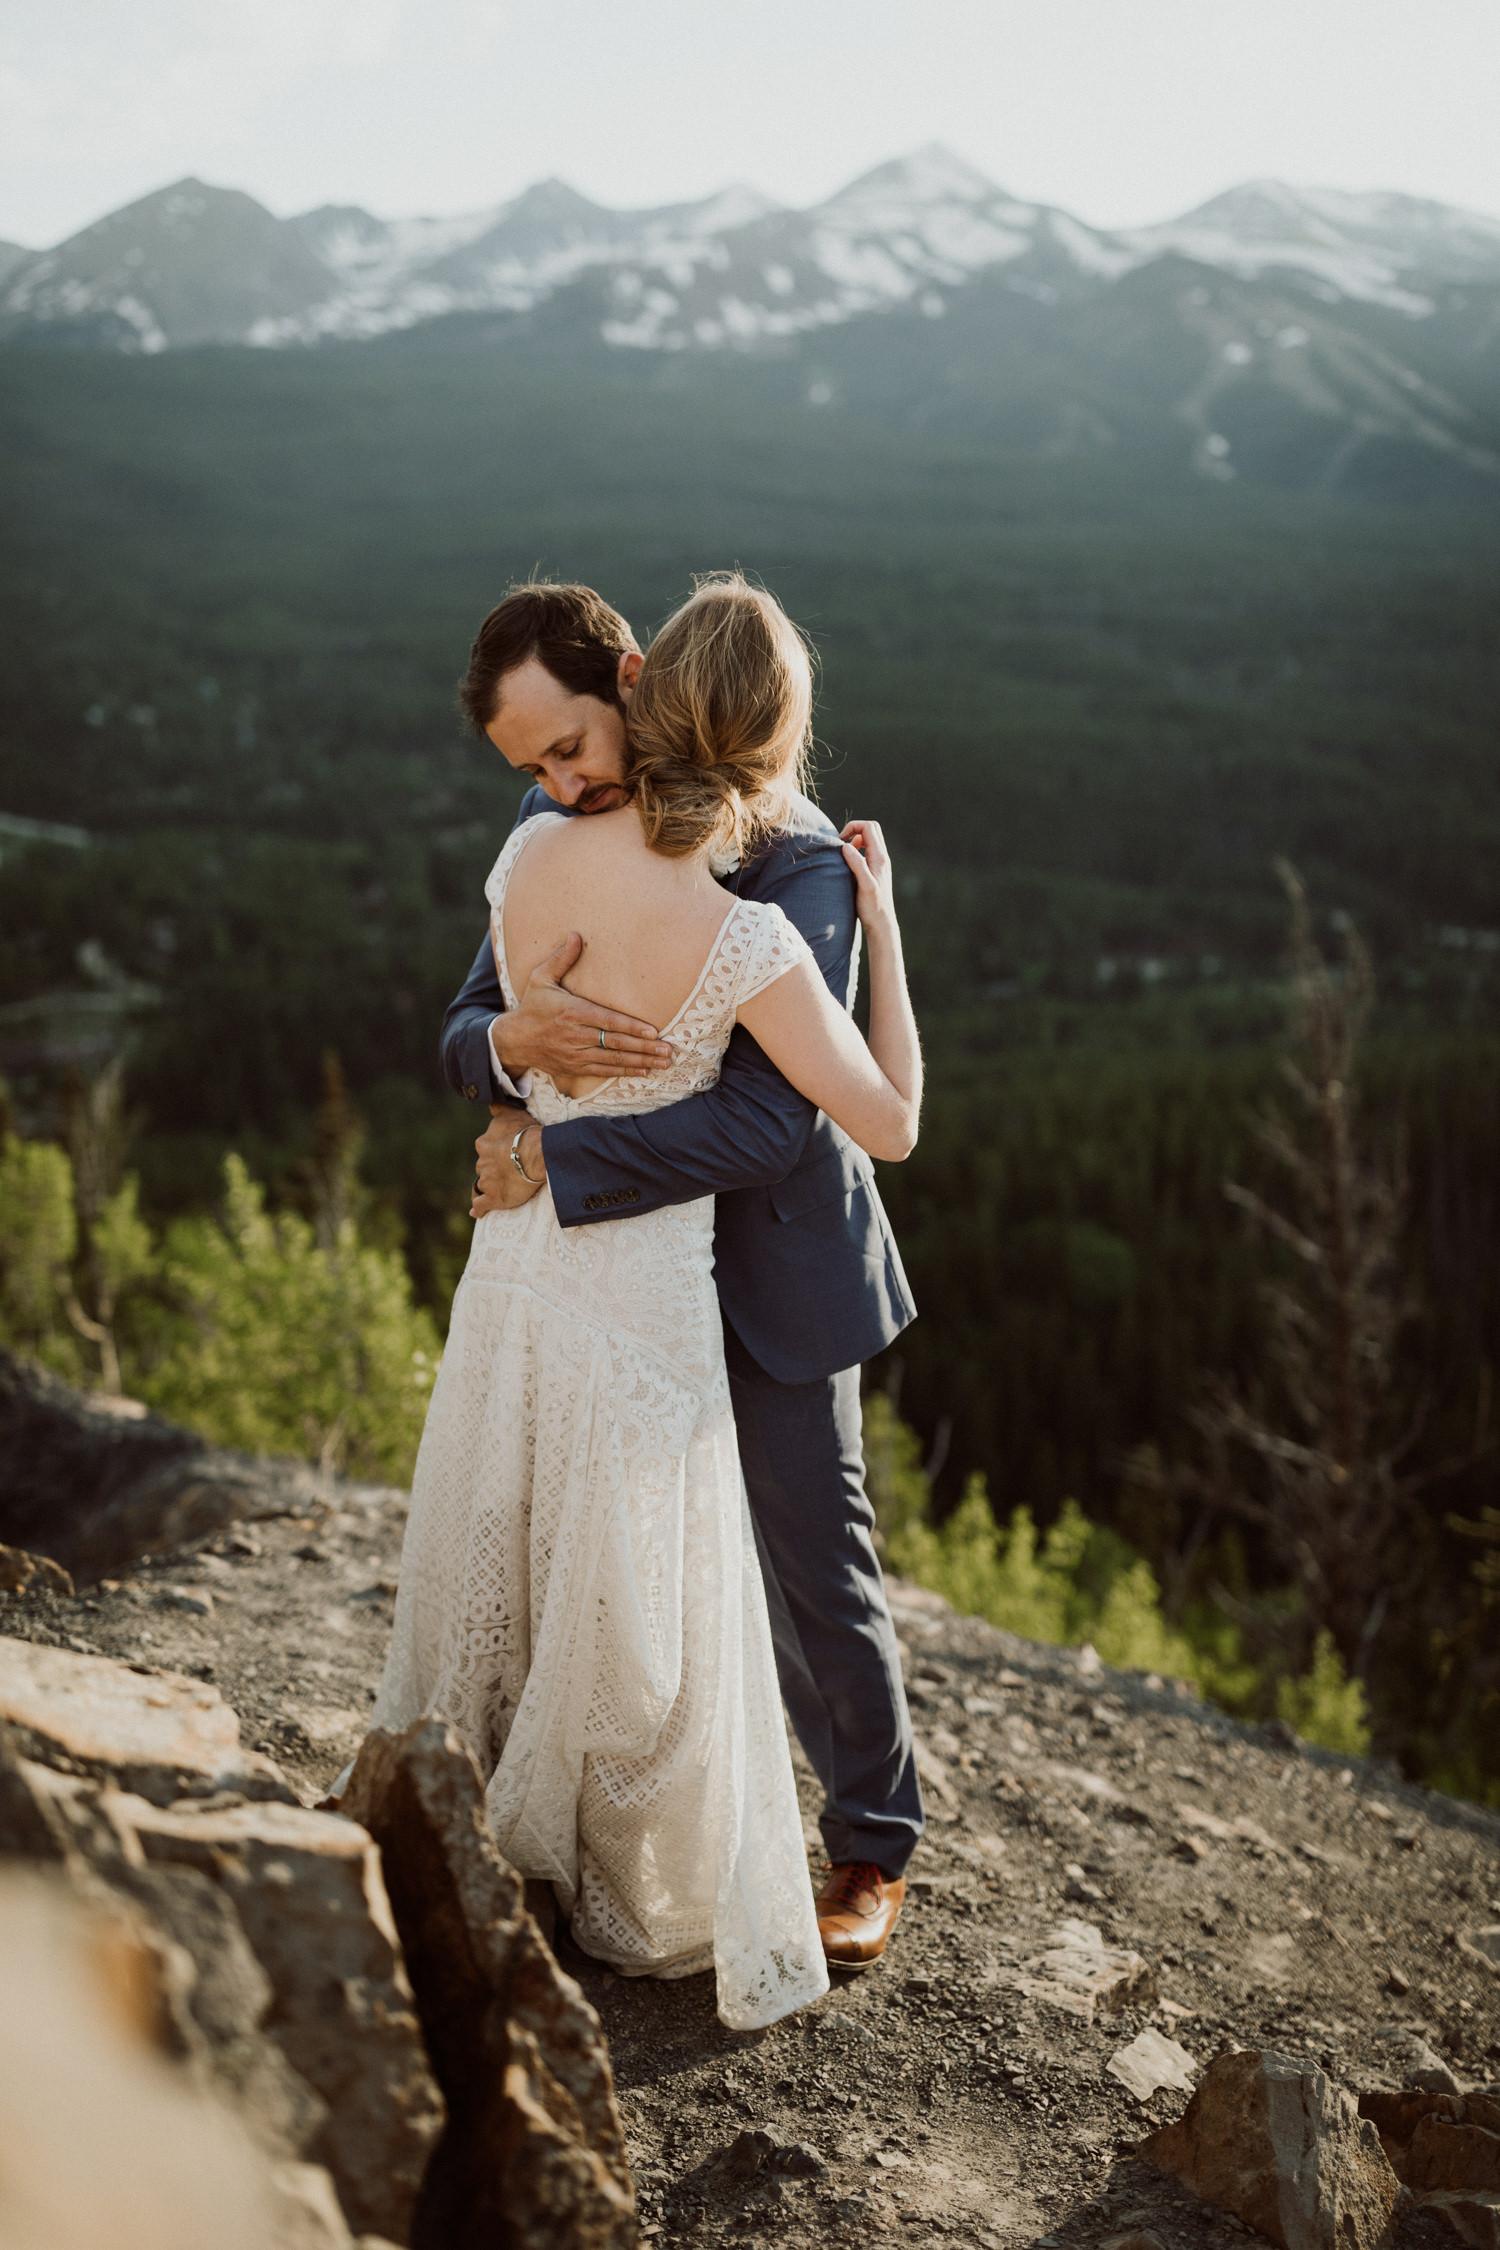 bohemian-backyard-wedding-breckenridge-colorado-100.jpg